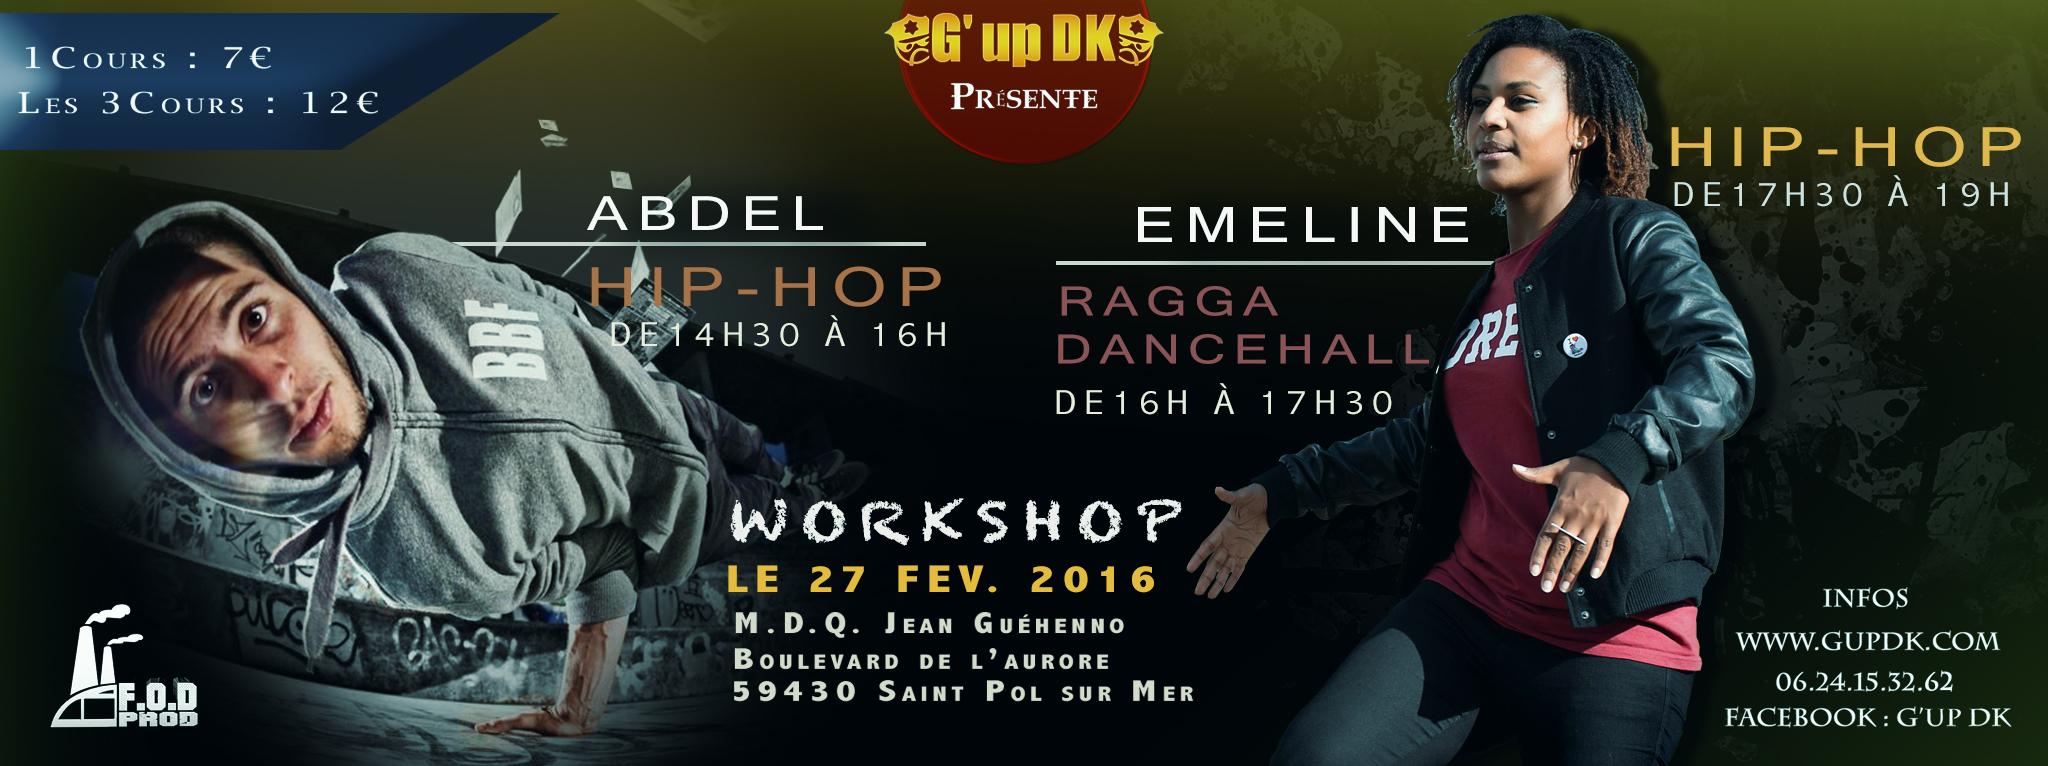 G'up Dk – Dance Hall Hip Hop 3